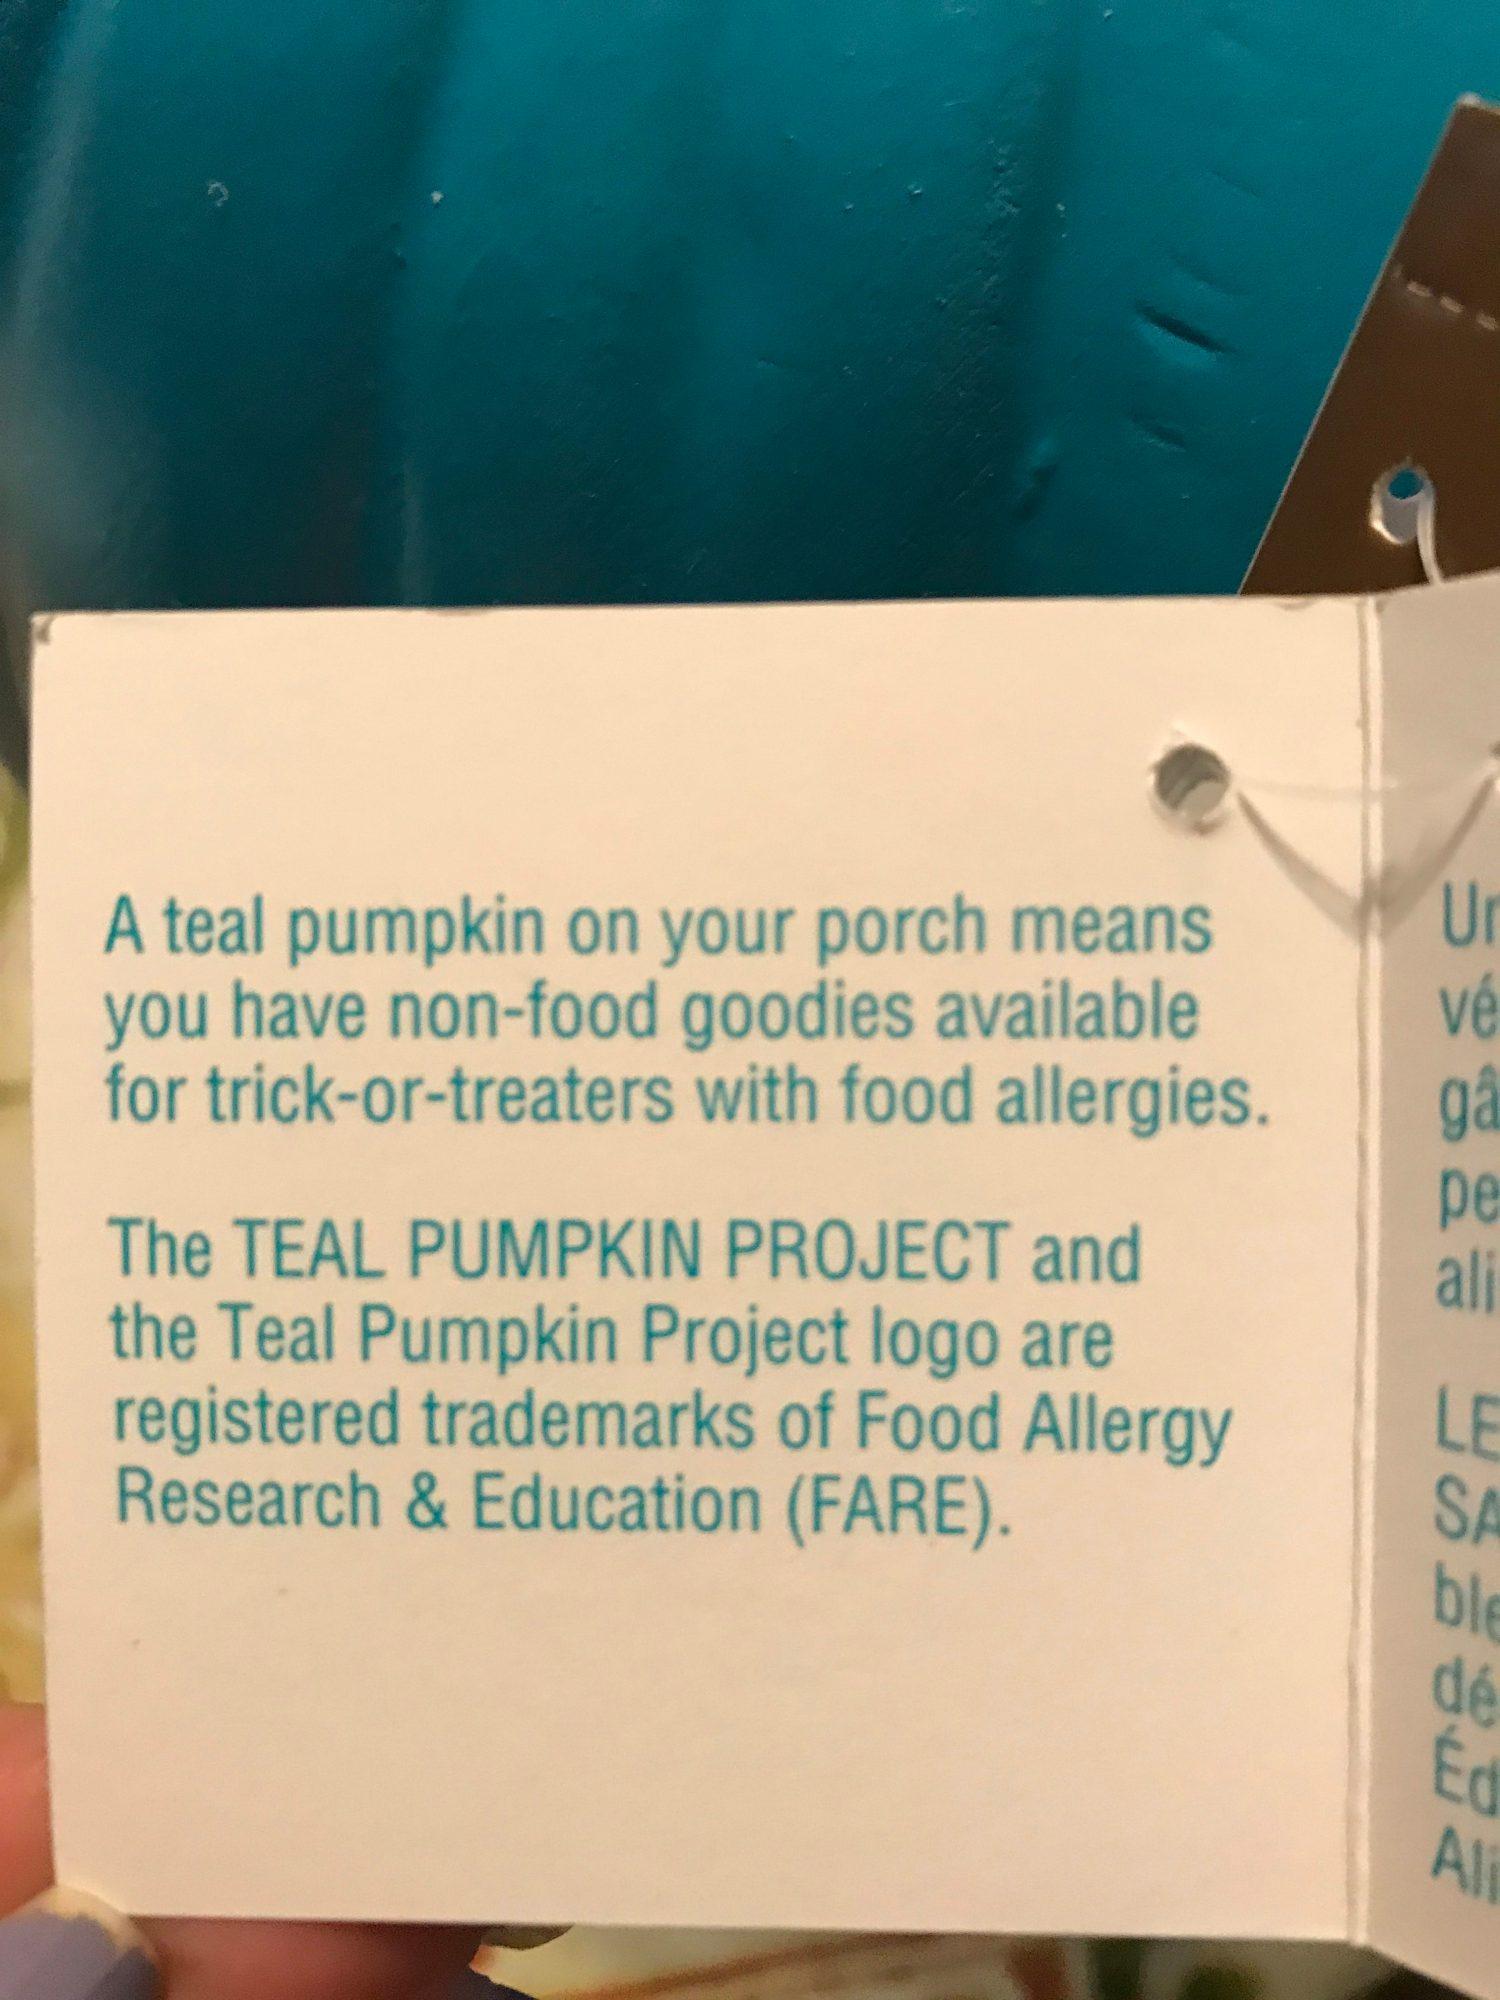 Teal Pumpkin Project helps spread awareness about non-allergen Halloween goodies.